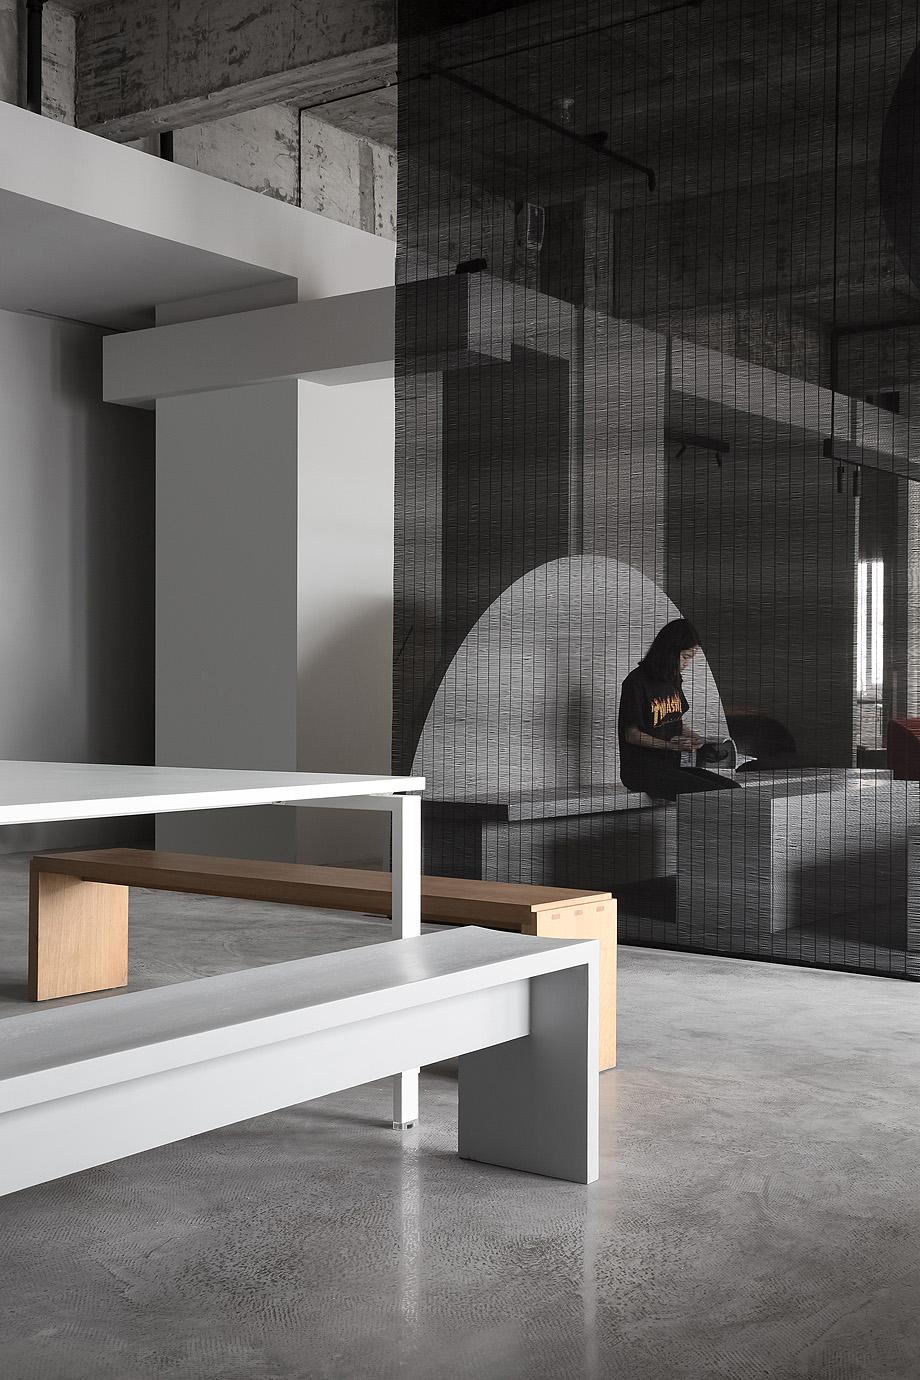 oficinas xzone de ad architecture - foto ouyang yun (7)